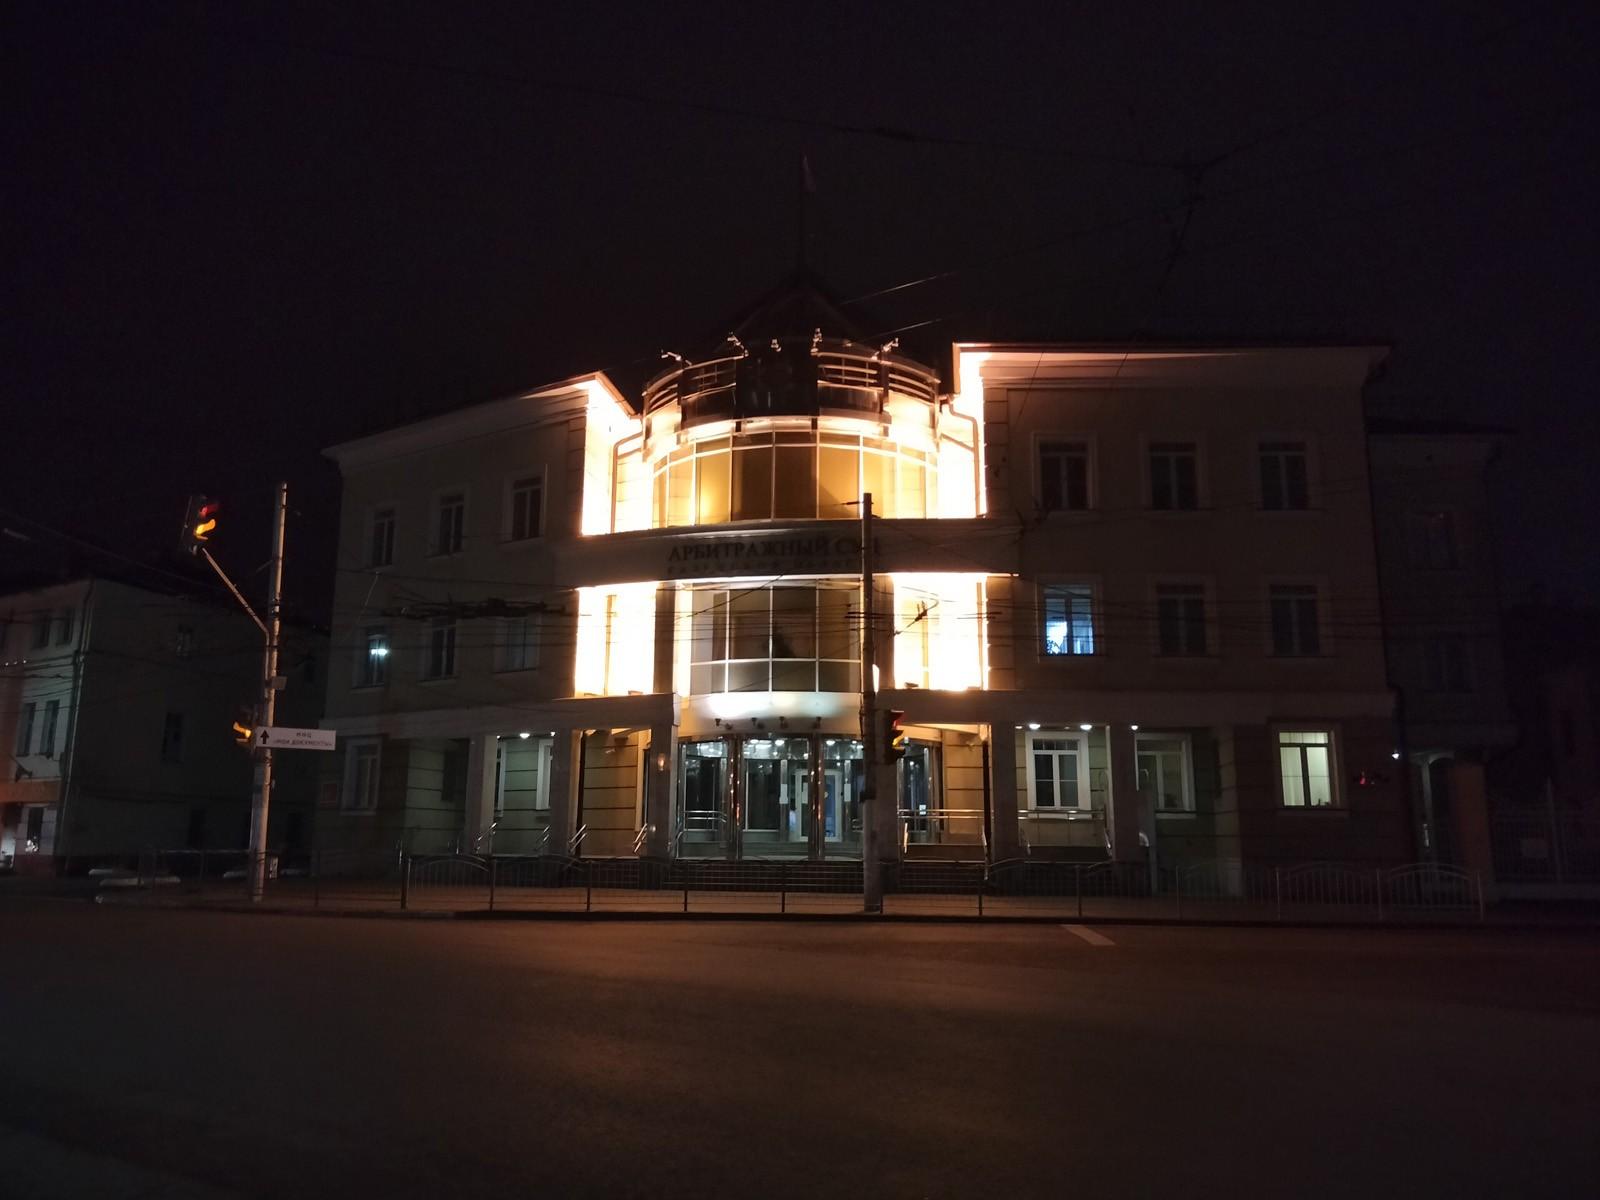 Ночной снимок, снятый на автомате на камеру OPPO A53